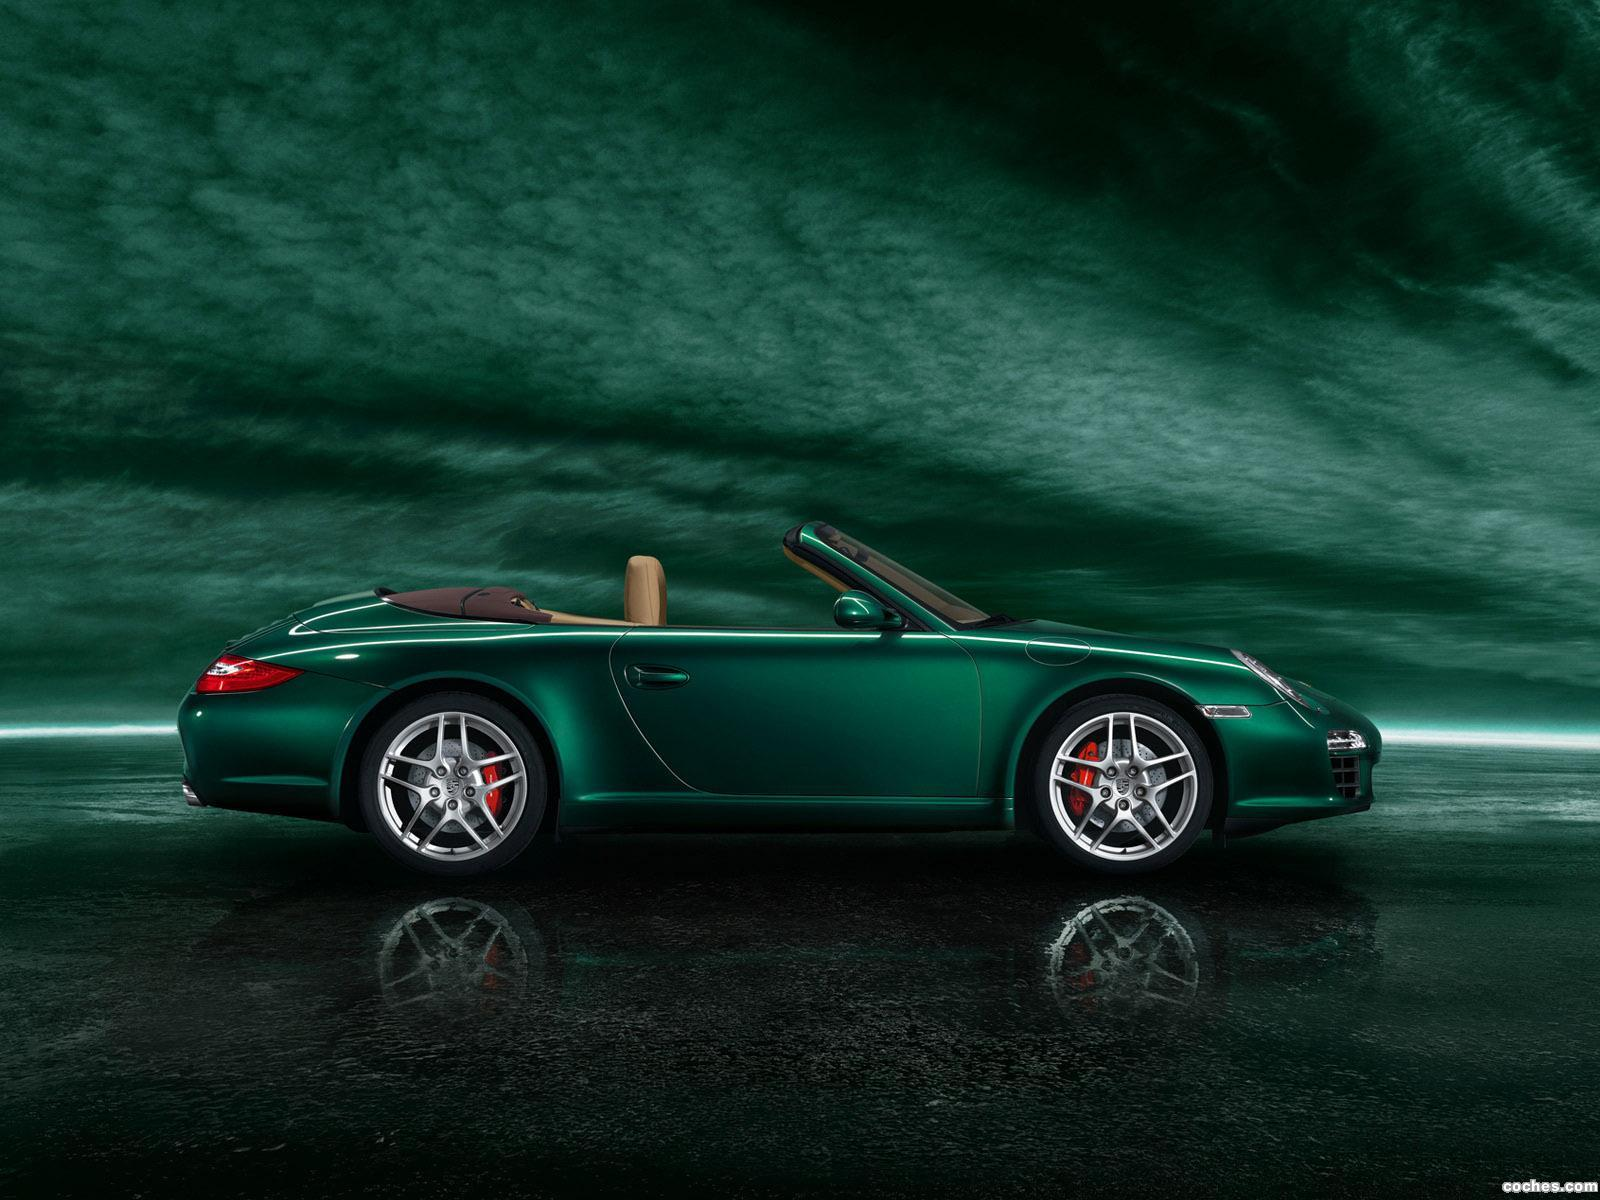 Foto 3 de Porsche 911 Carrera S Cabriolet 997 2008